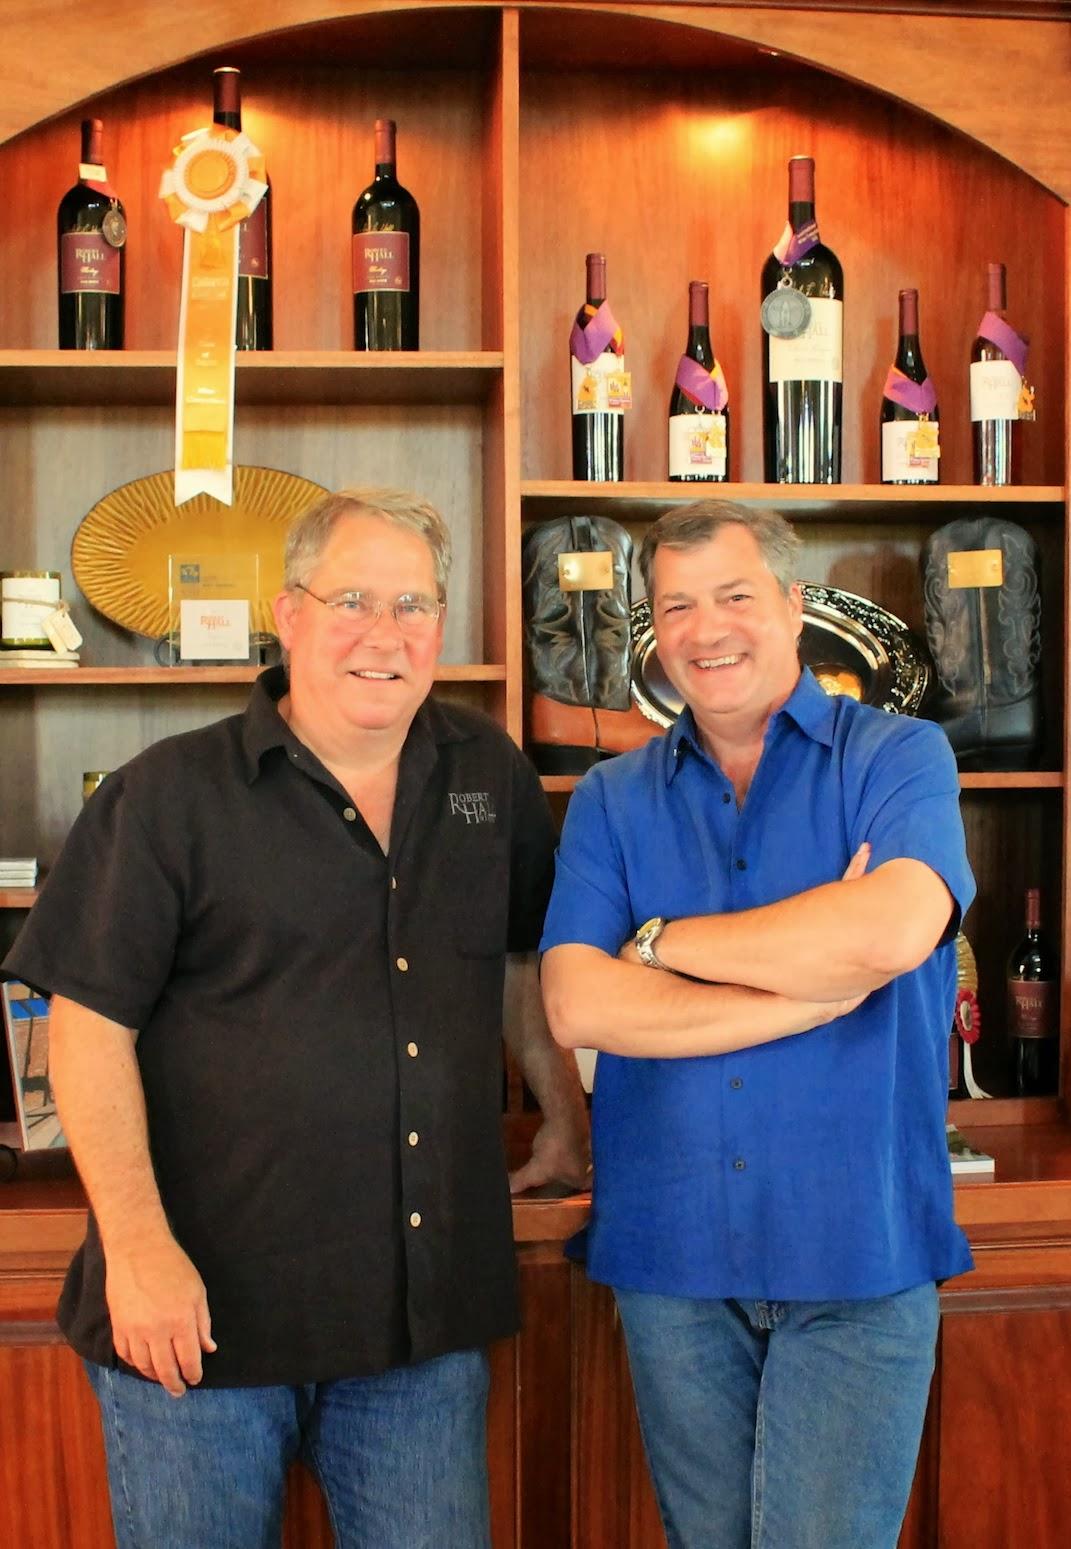 Boozehoundz Tasting With Don Brady Winemaker At Robert